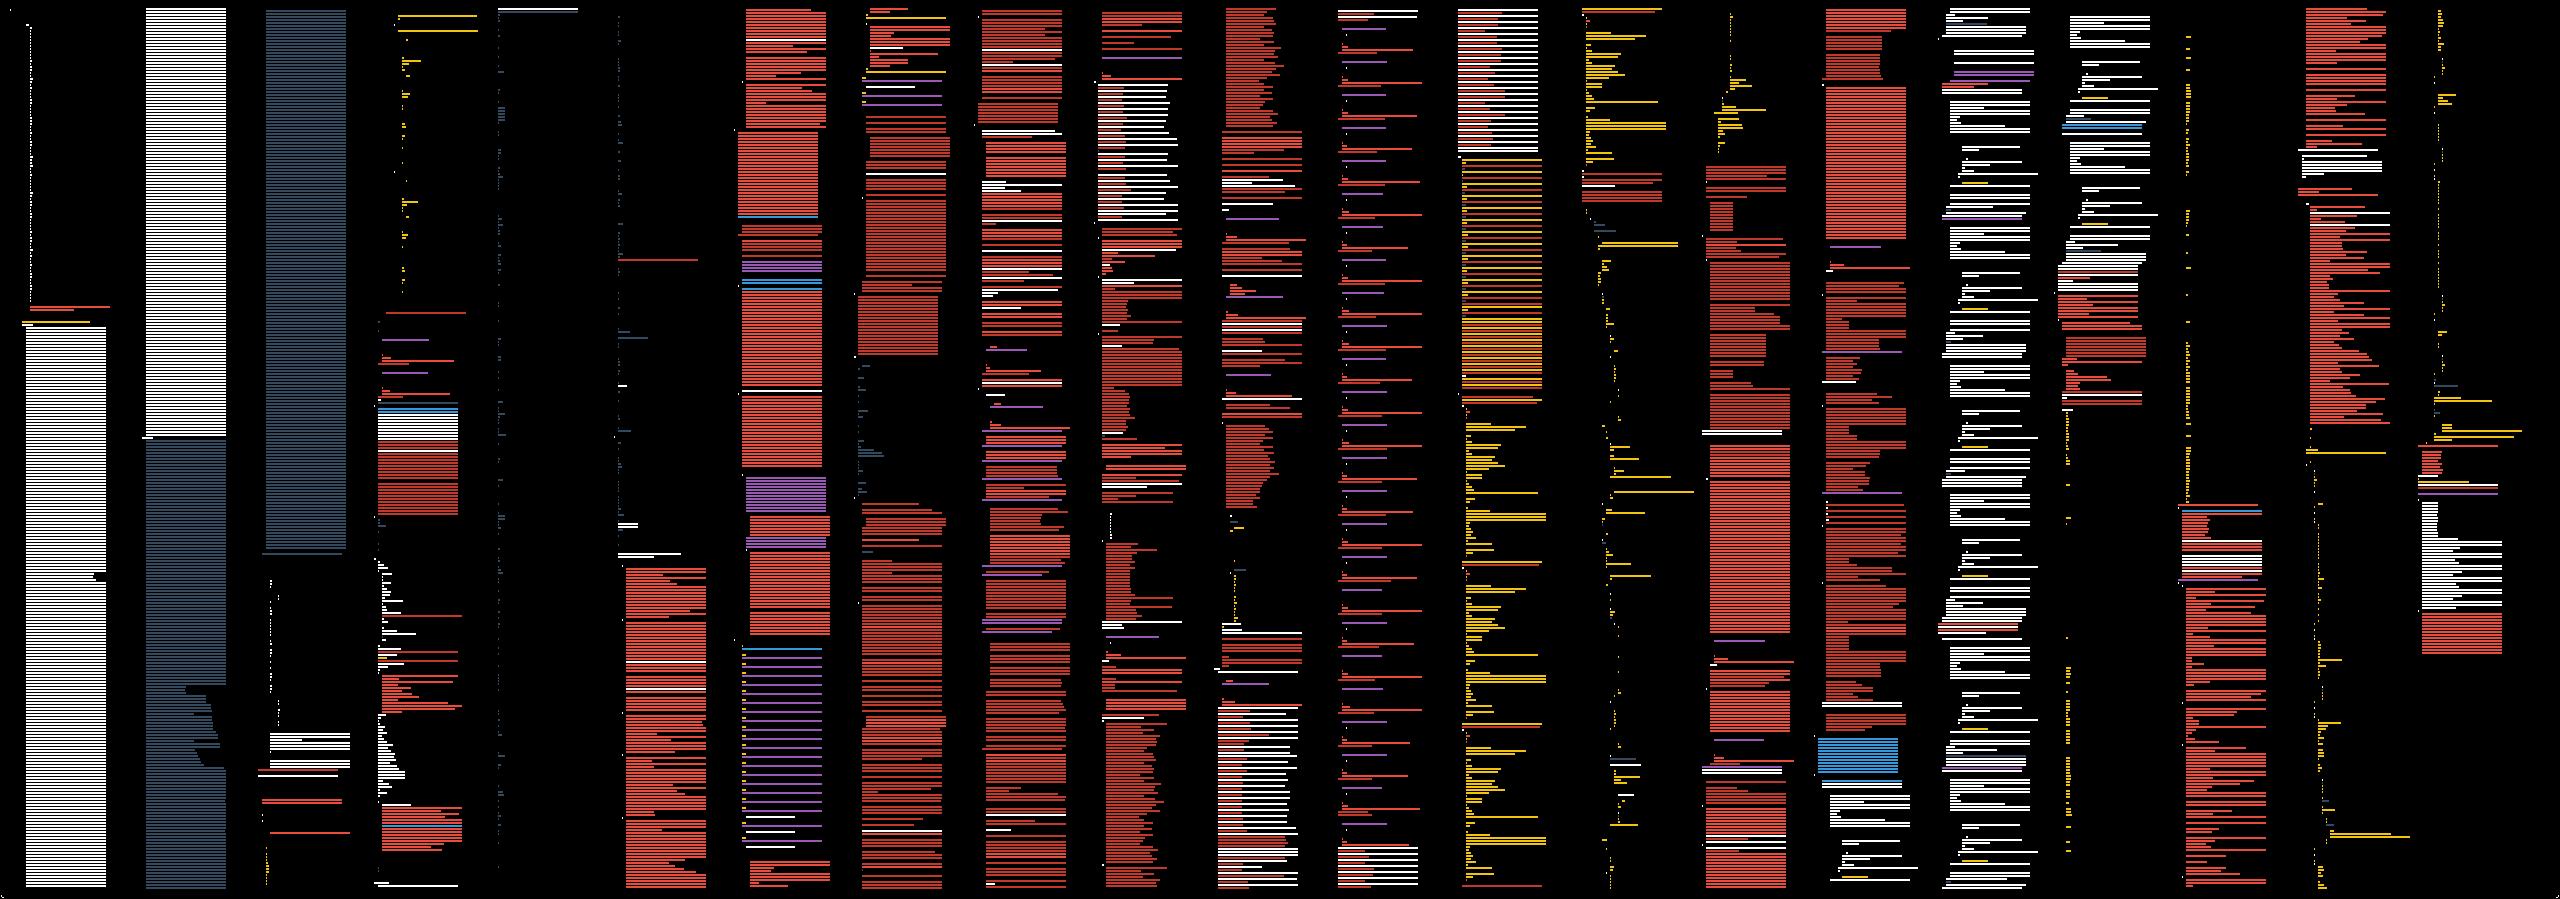 variable // Dropbox Timespace // data driven art and generative design